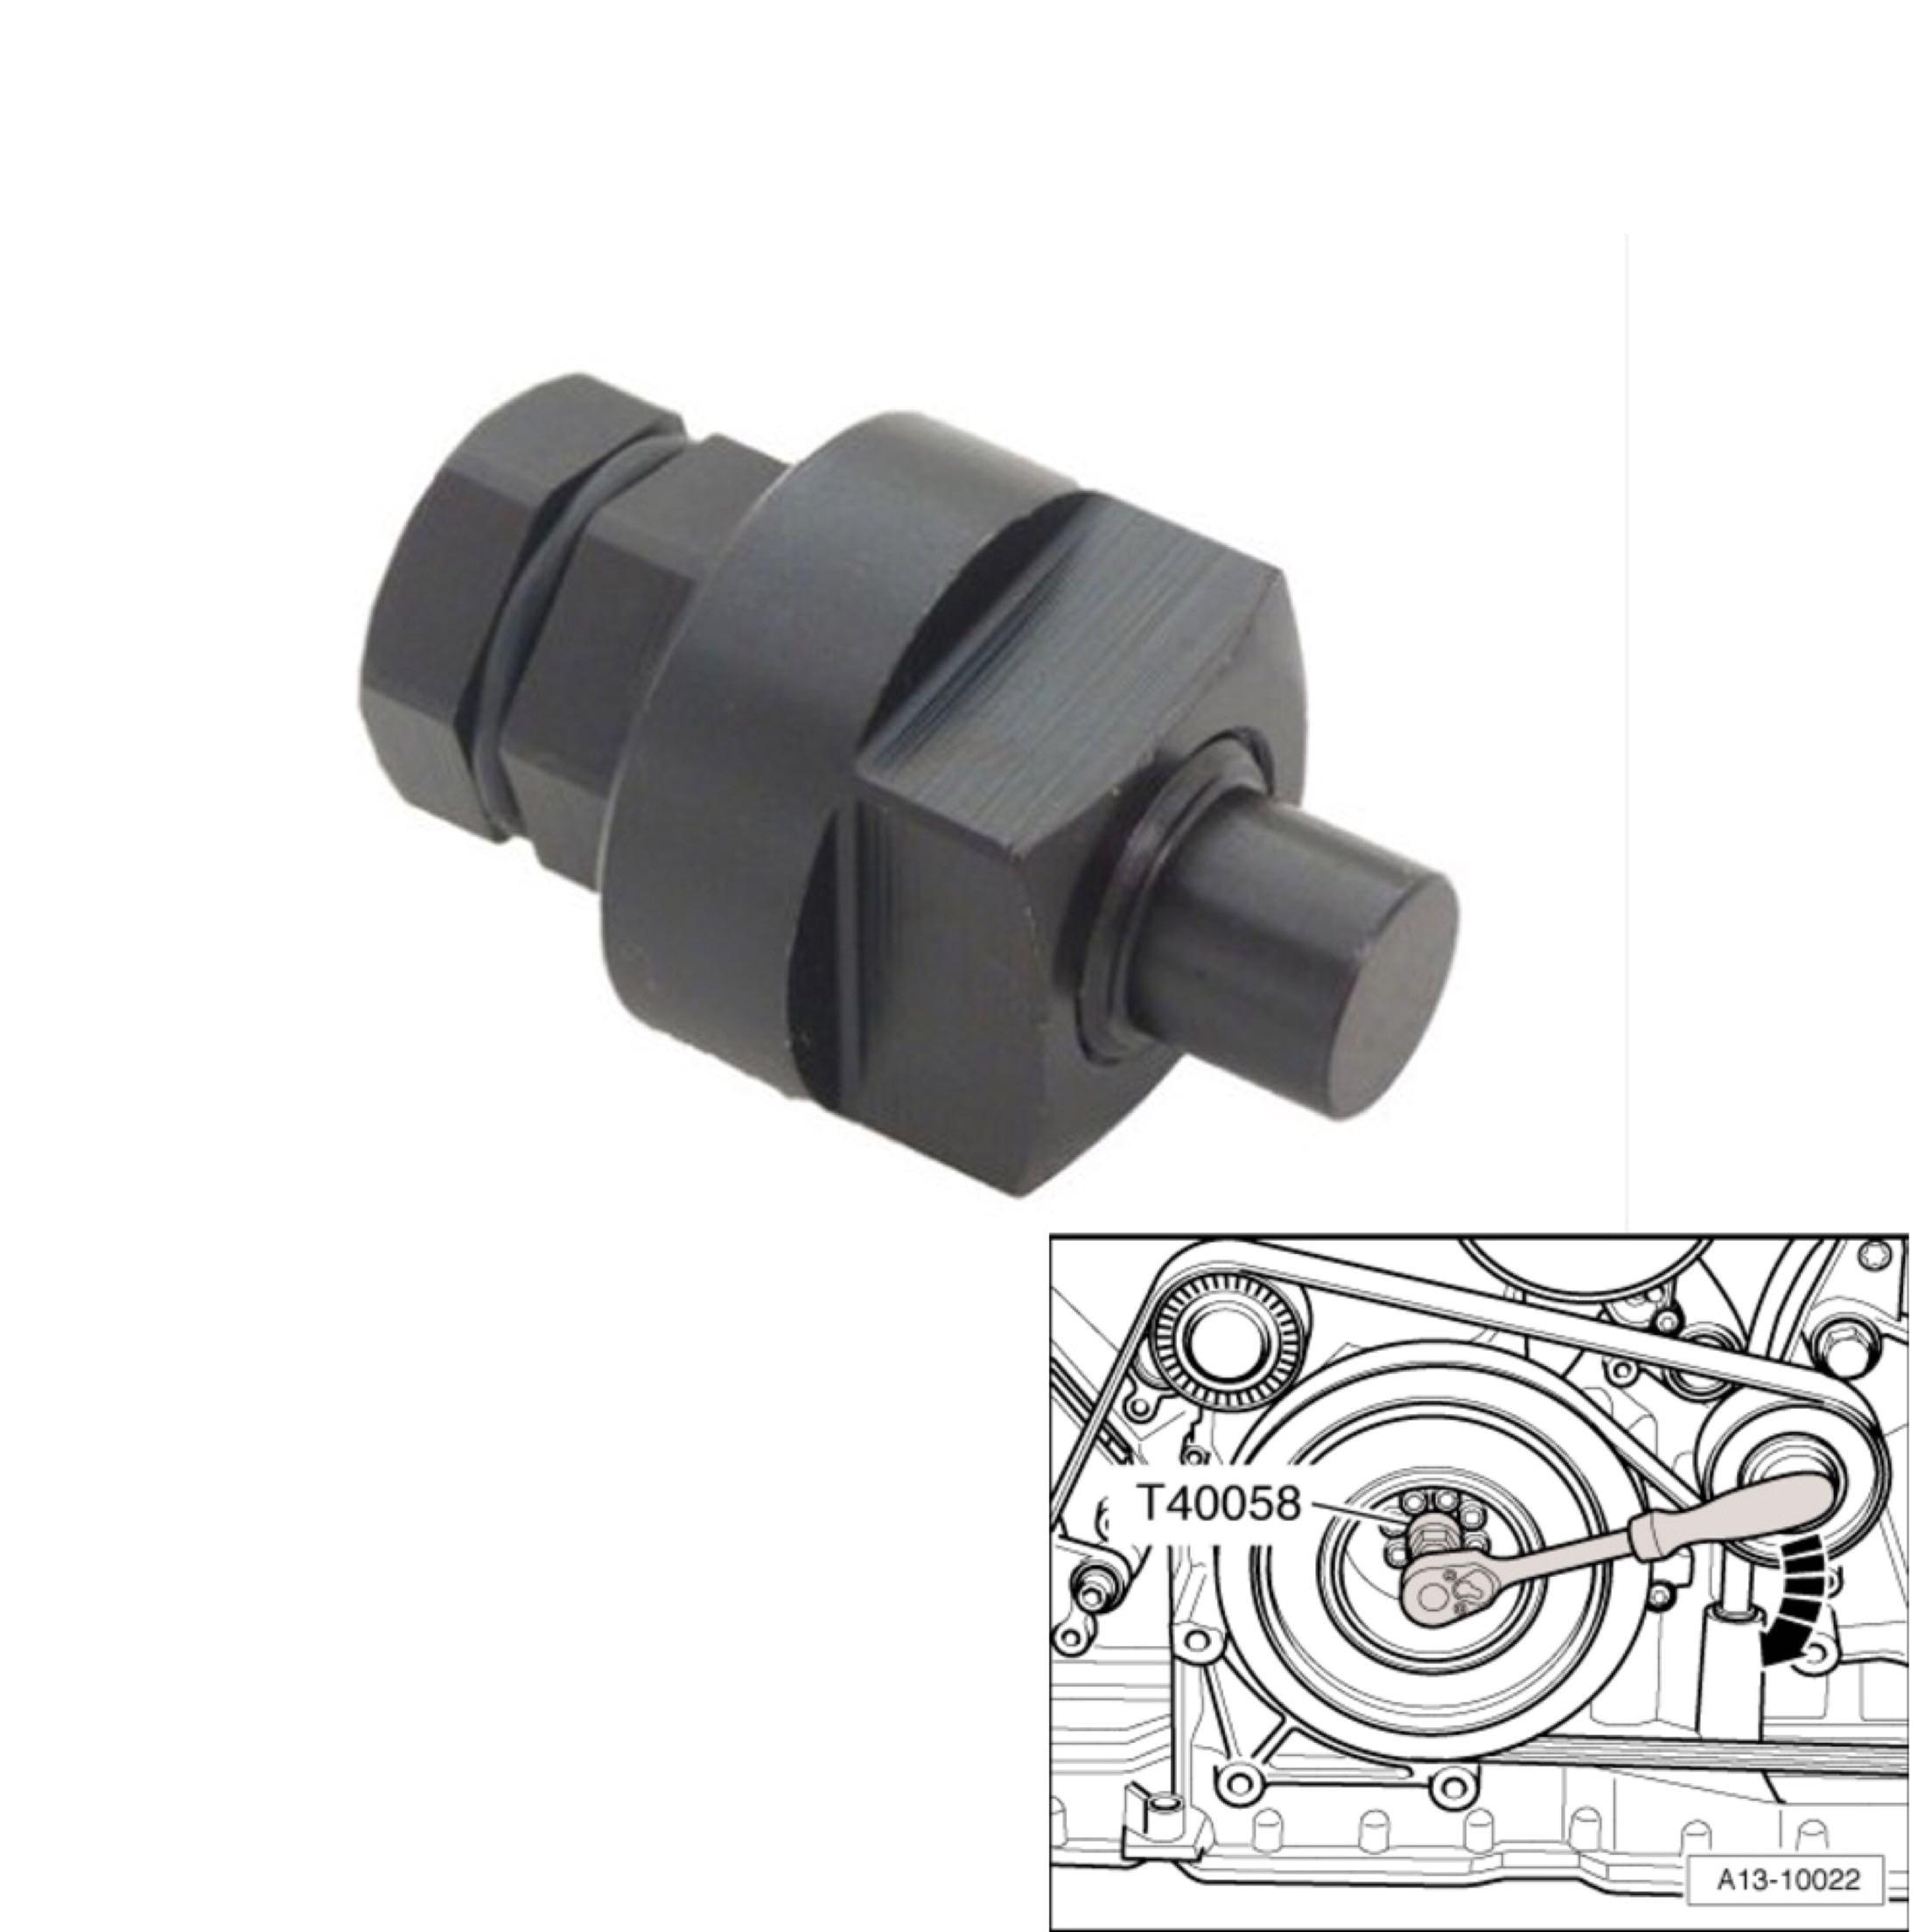 T40058 for Volkswagen Touareg Phaeton Audi A6 A8 A7 crankshaft rotation adjustment sleeve repair tim